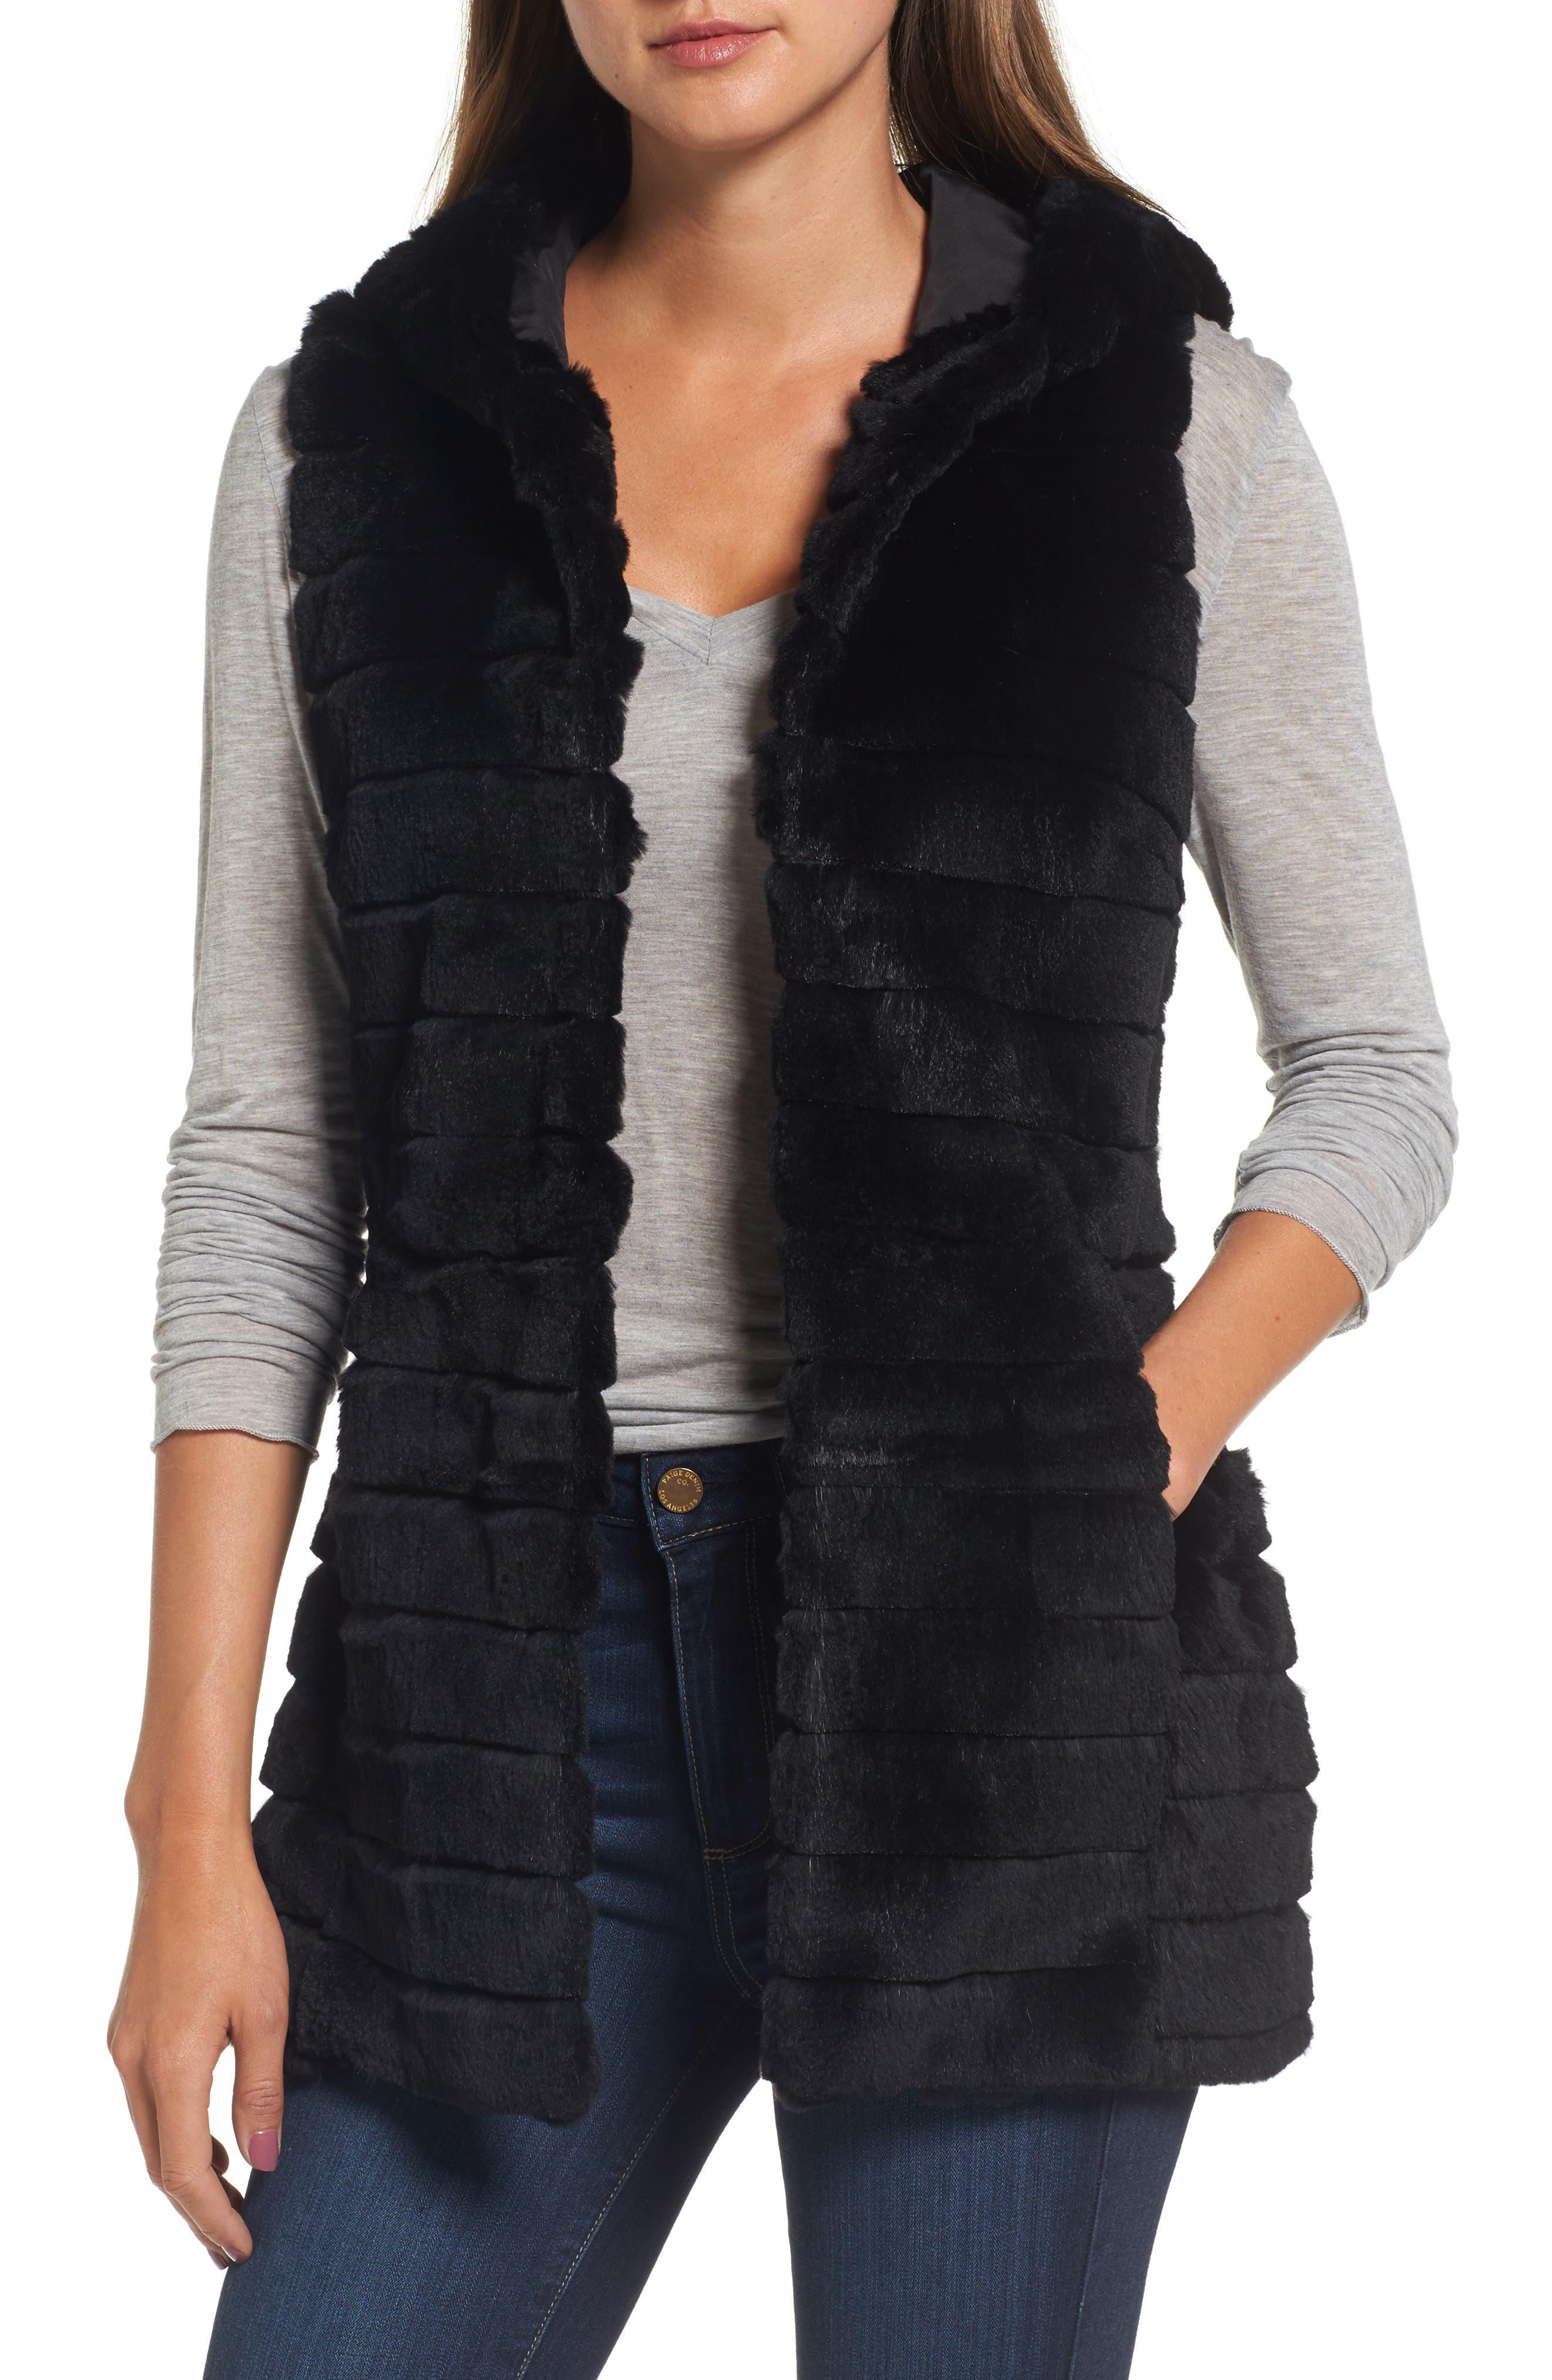 Genuine Rabbit Fur Hooded Vest,                             Main thumbnail 1, color,                             001